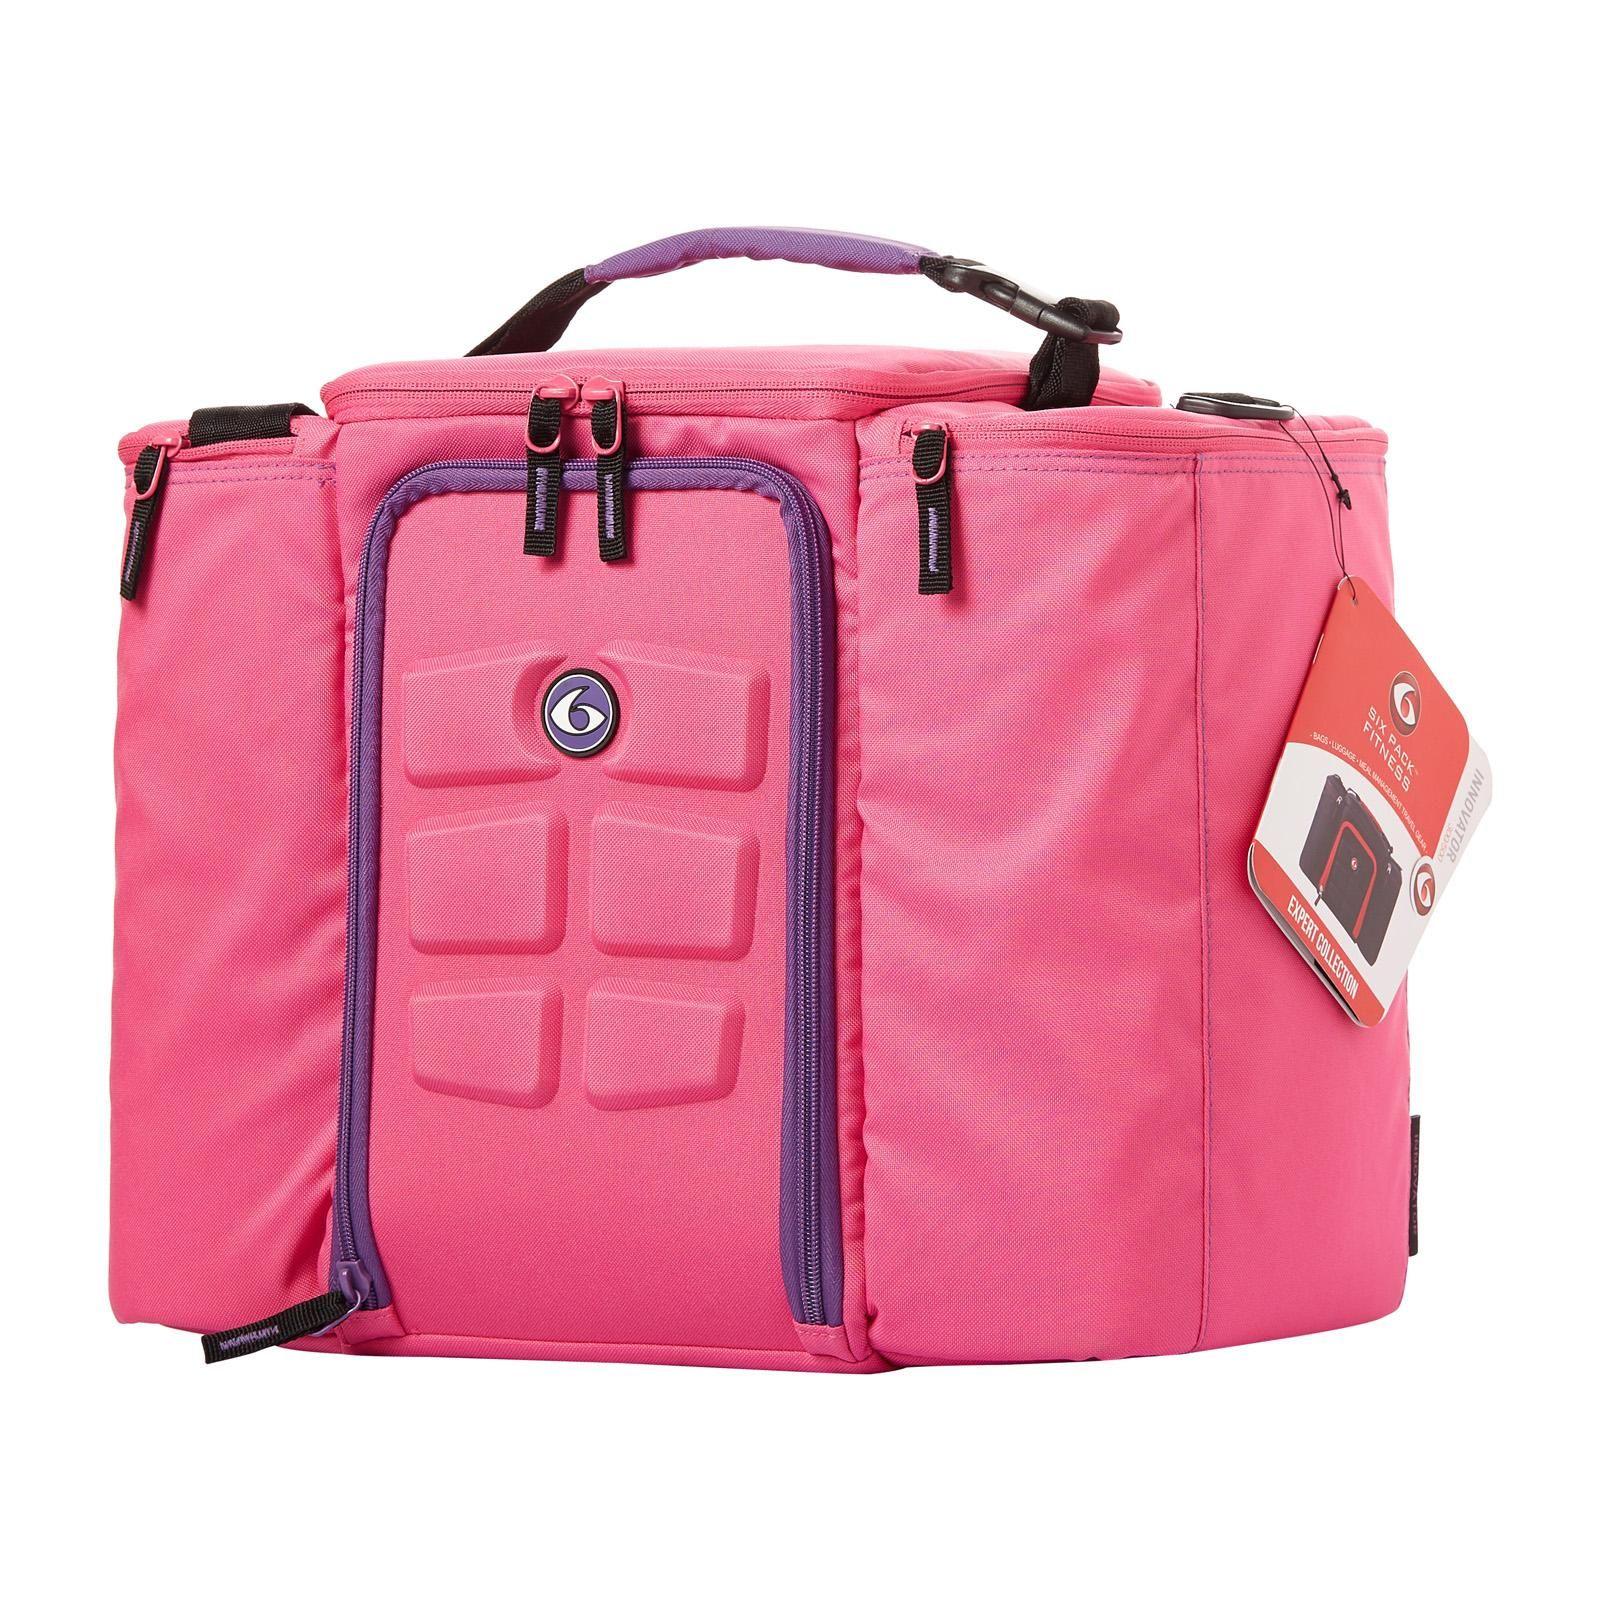 Taška na jedlo Expert Innovator 500 Pink/Purple - 6 Pack Fitness